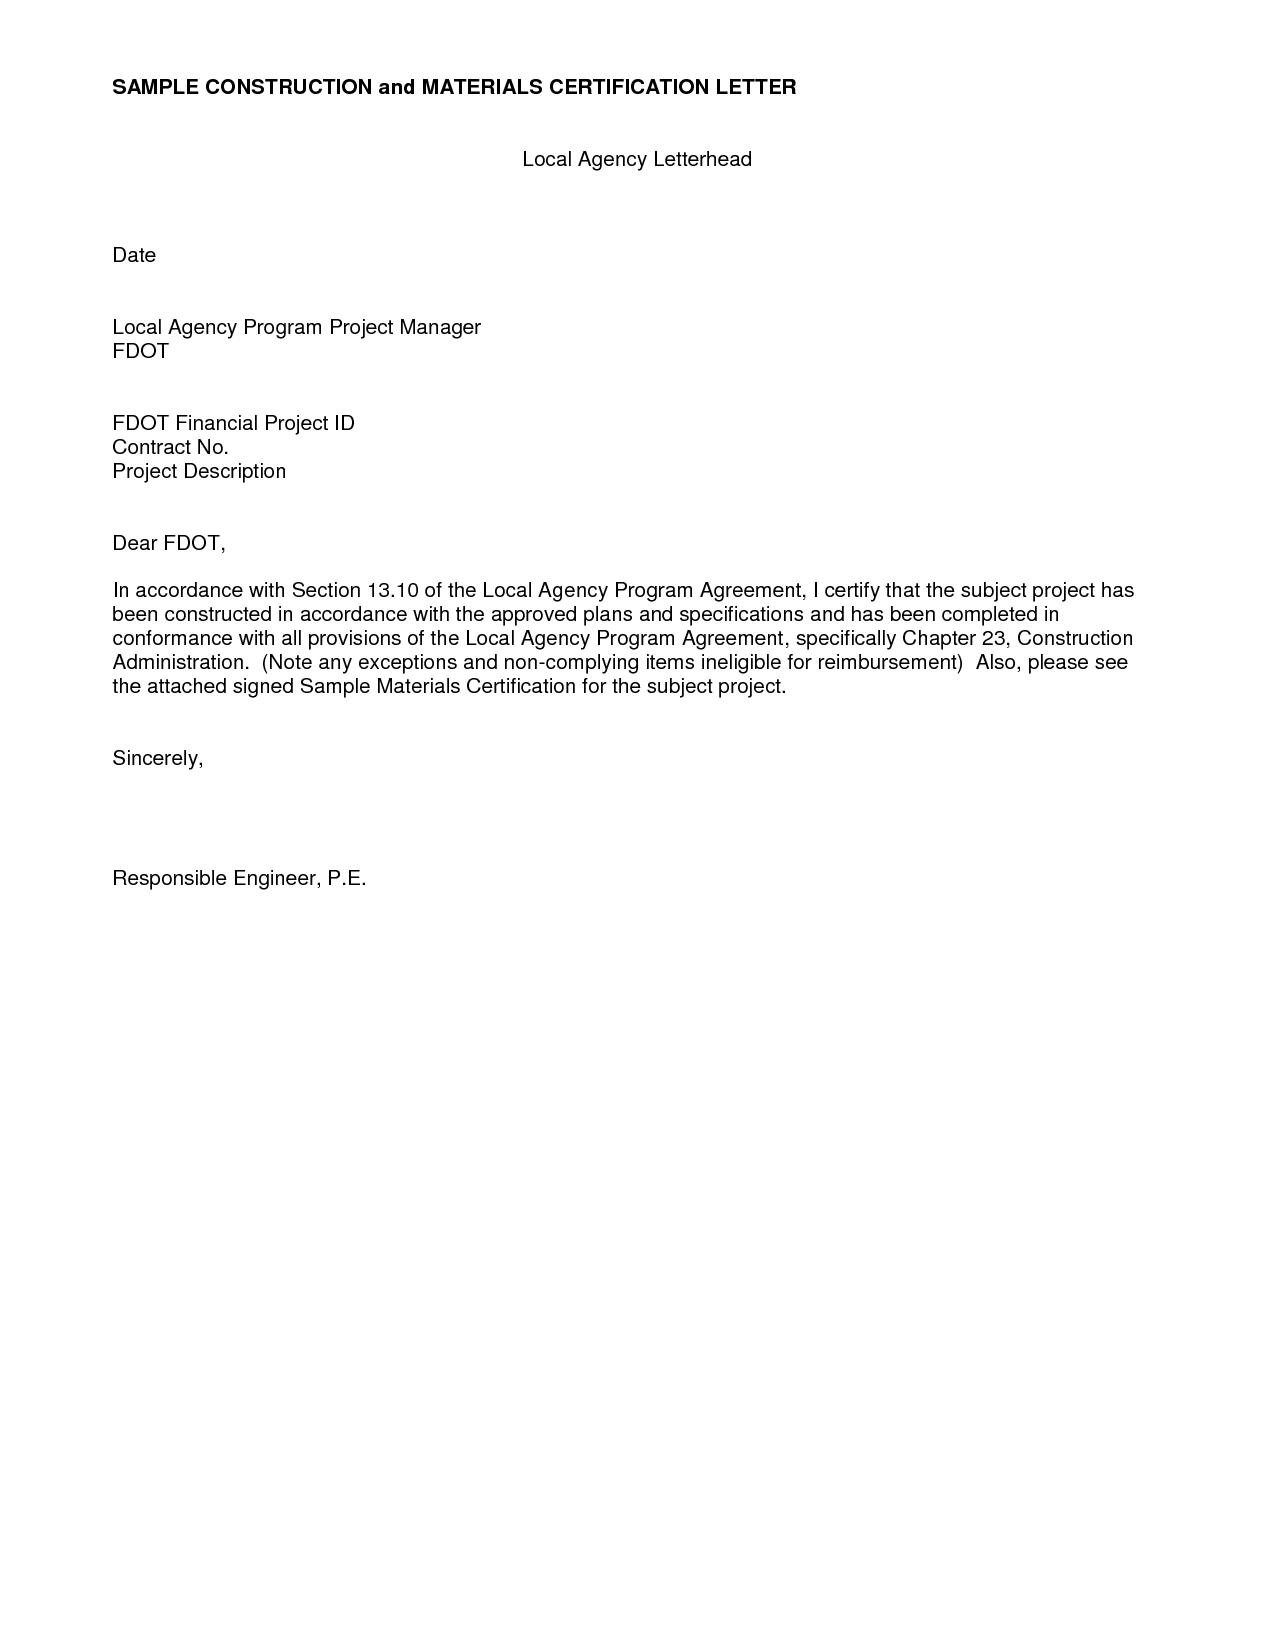 Photos Sample Certification Letter Letters Livecareer Home Design